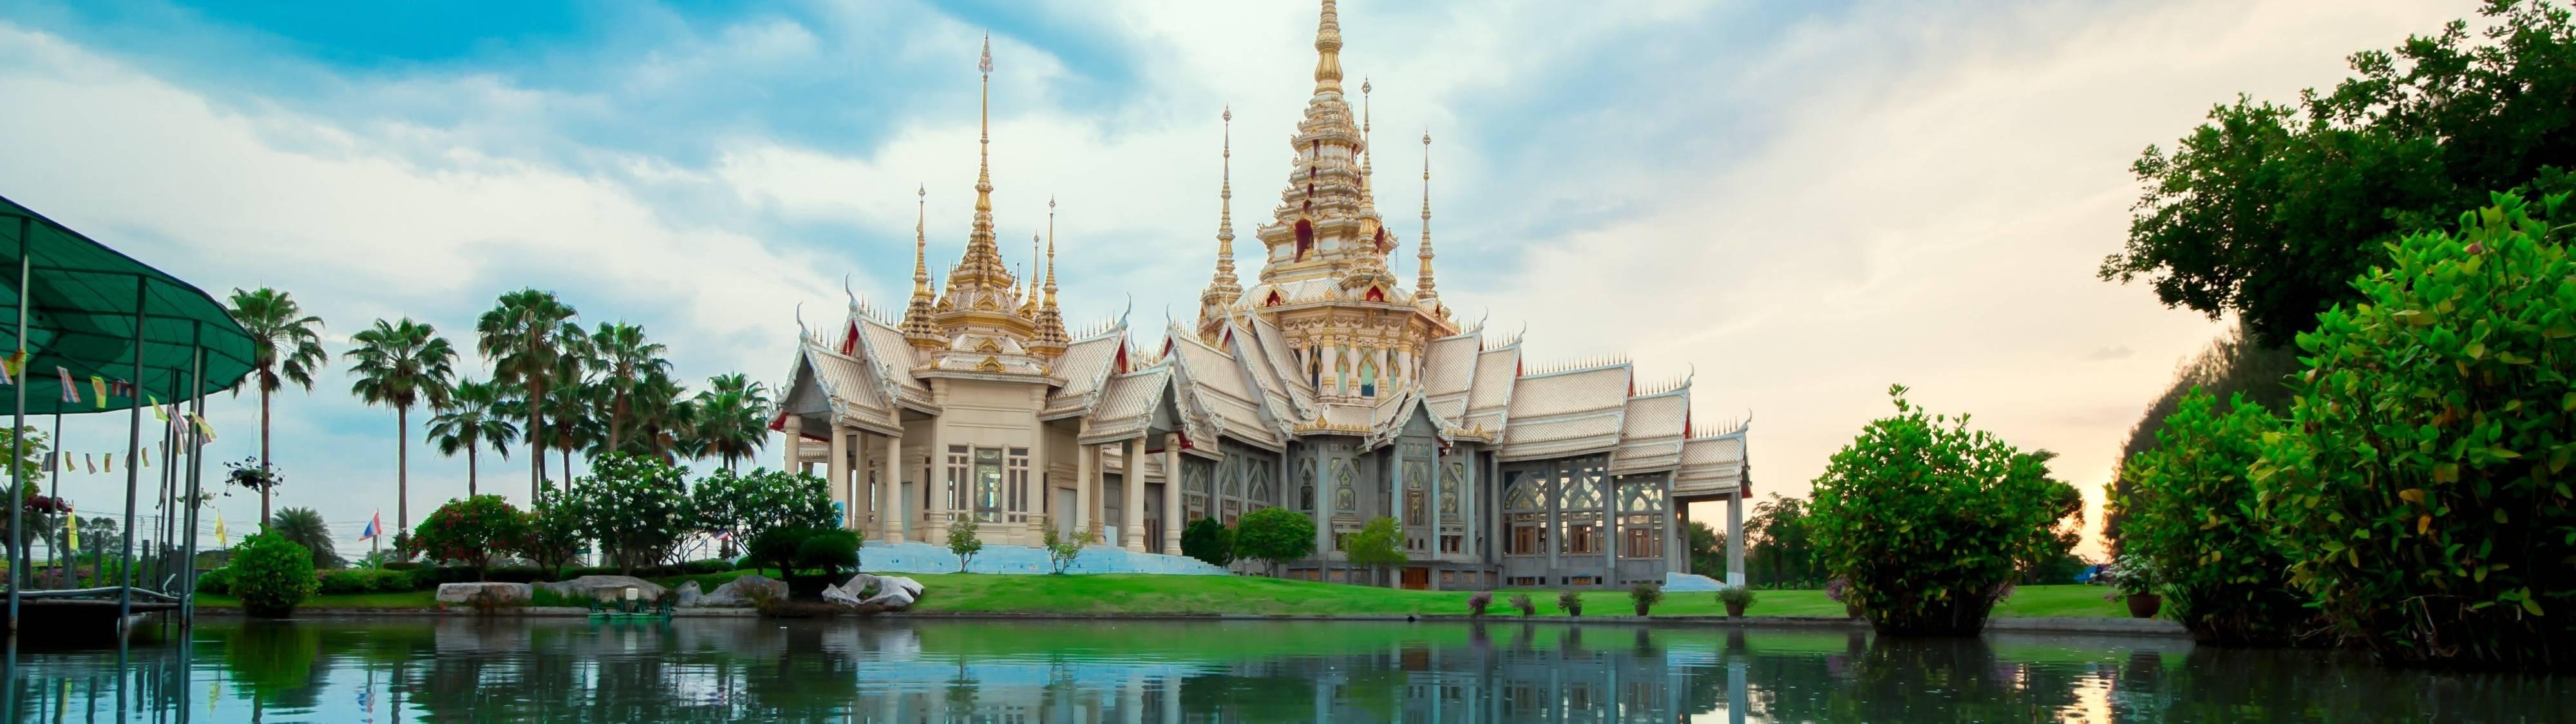 Reiseplaner Backpacking Thailand